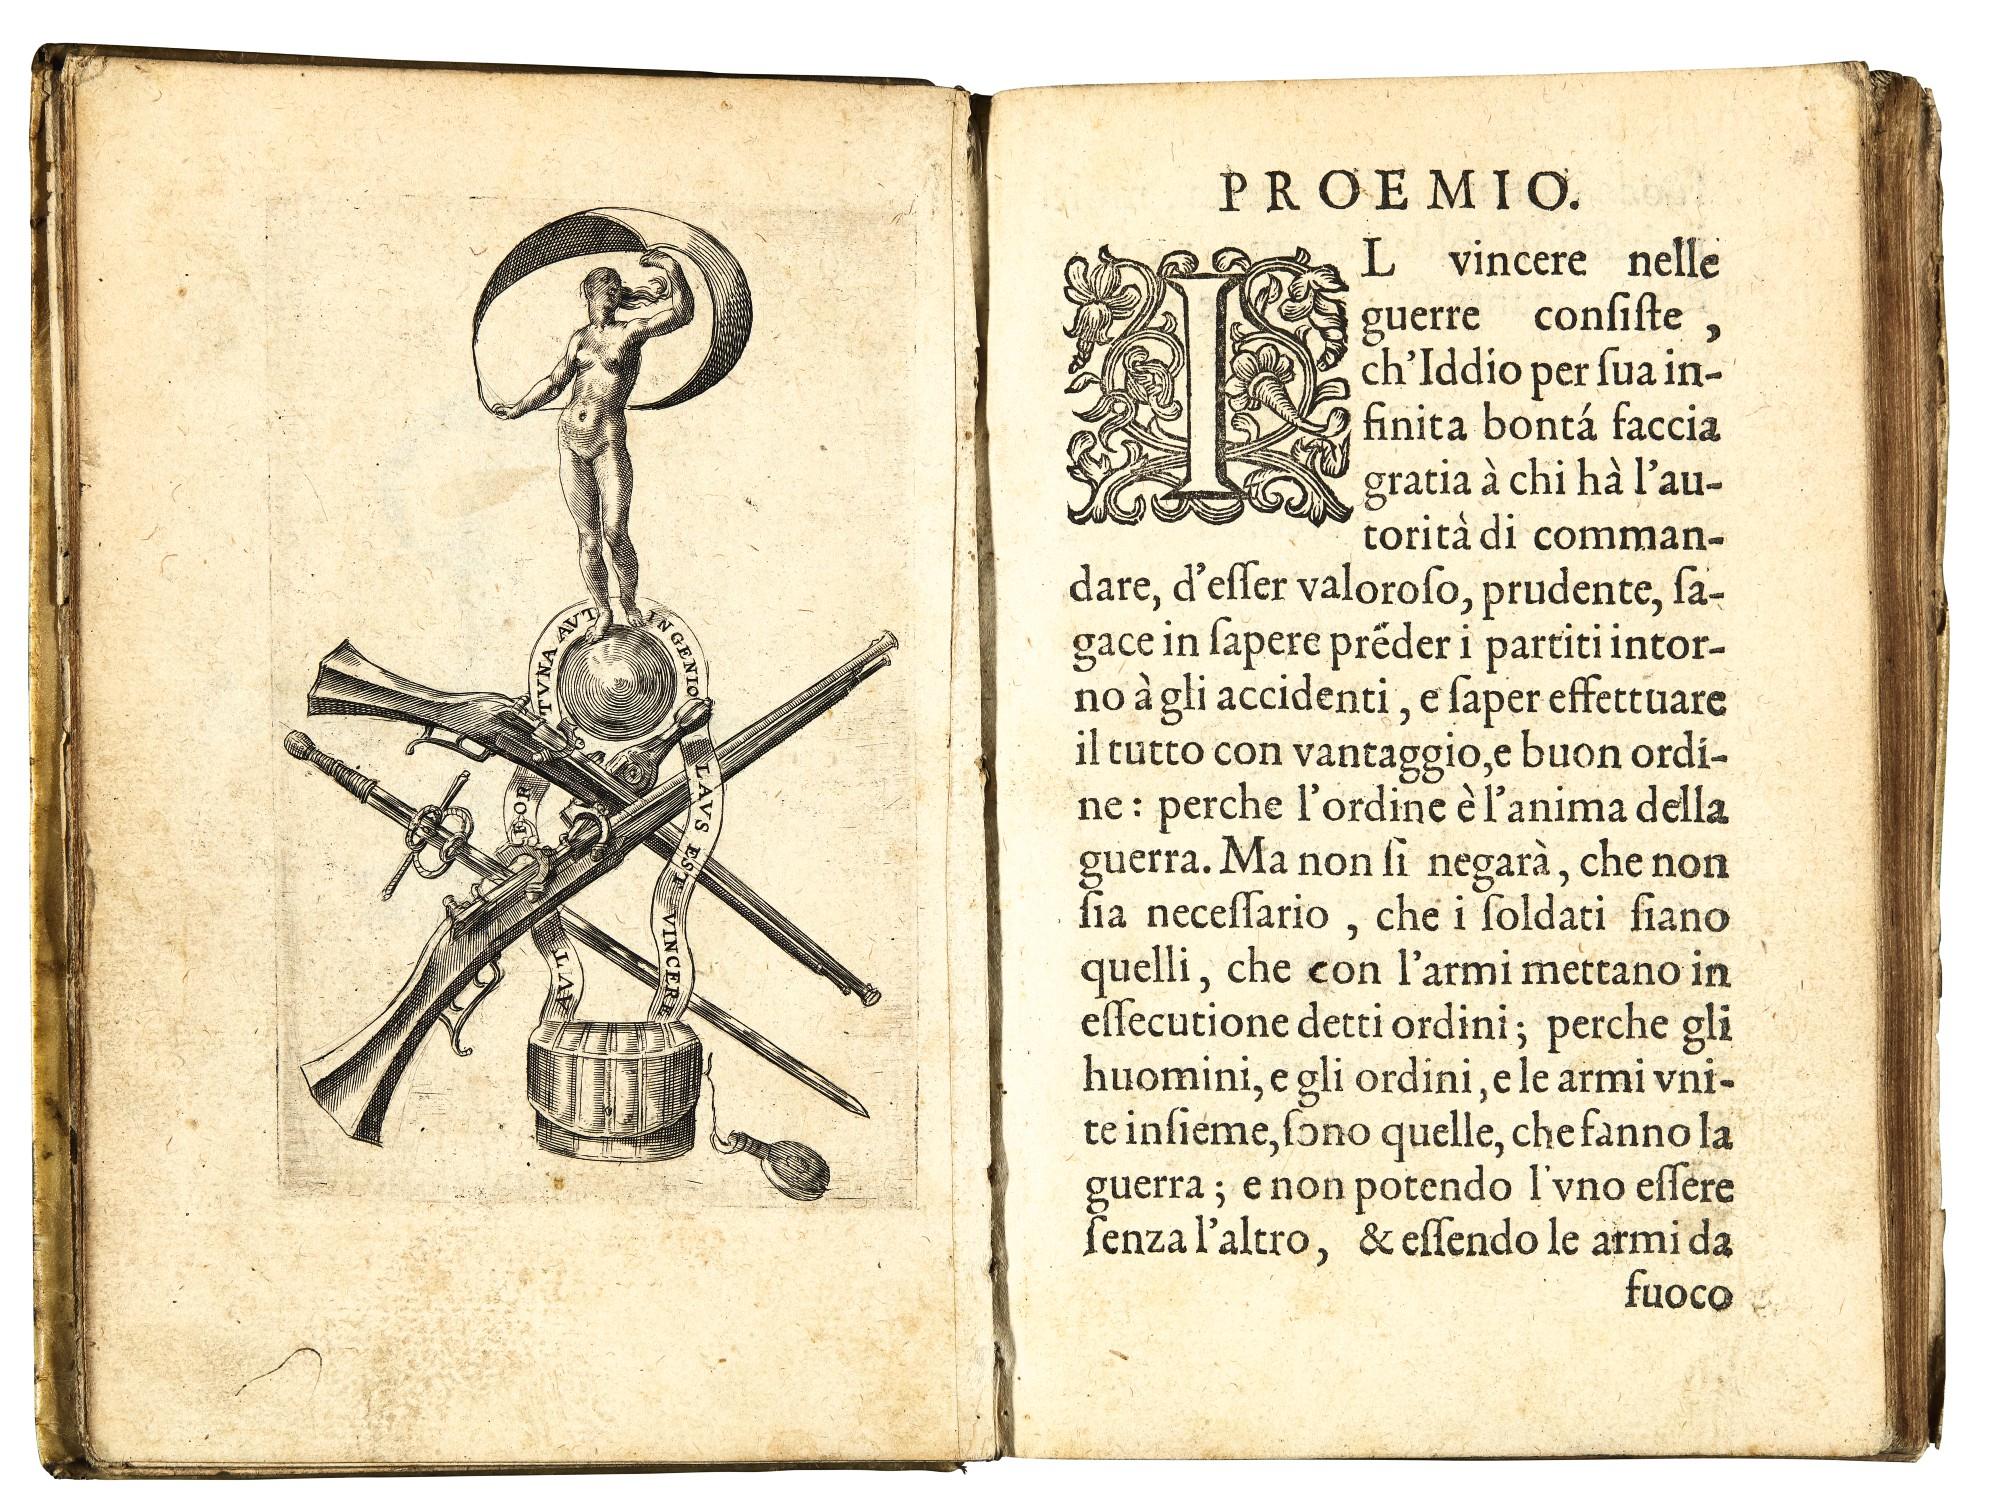 Artillery, works in Italian, by Alberghetti, Bossi, Gentilini, Papacino d'Antoni, Sardi, Zonta, 6 volumes